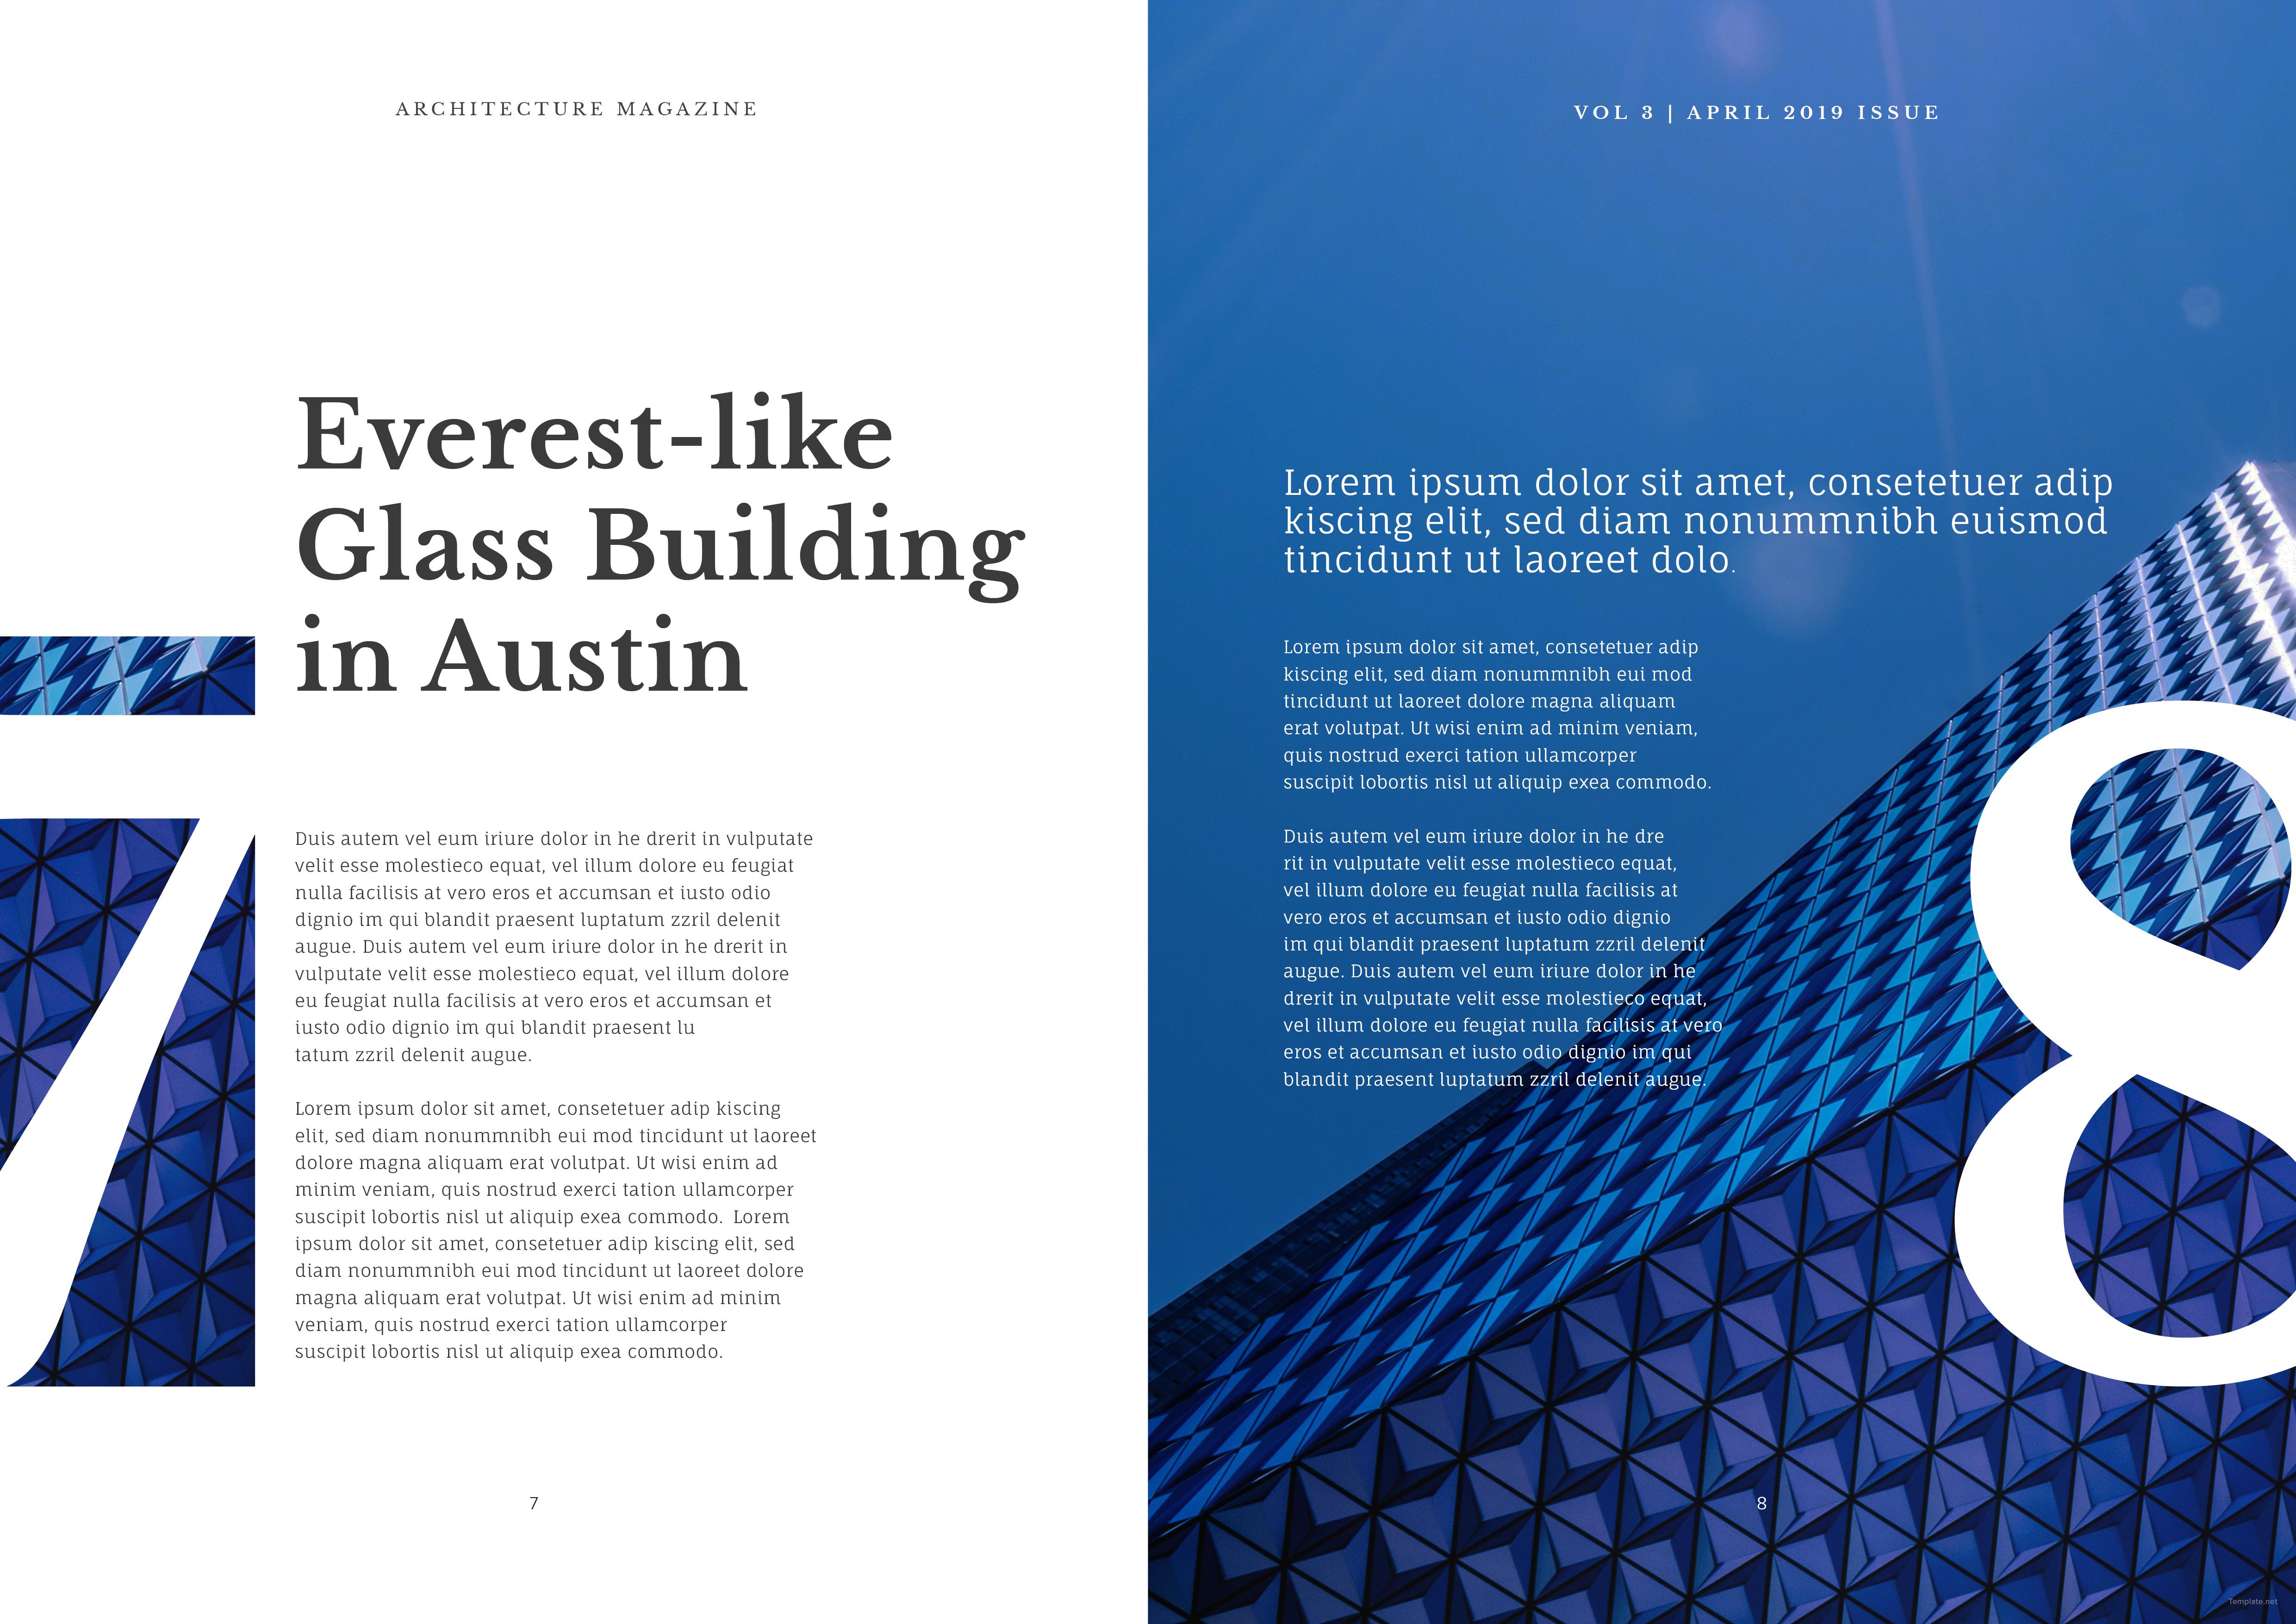 free architecture magazine template - Free Architecture Magazines